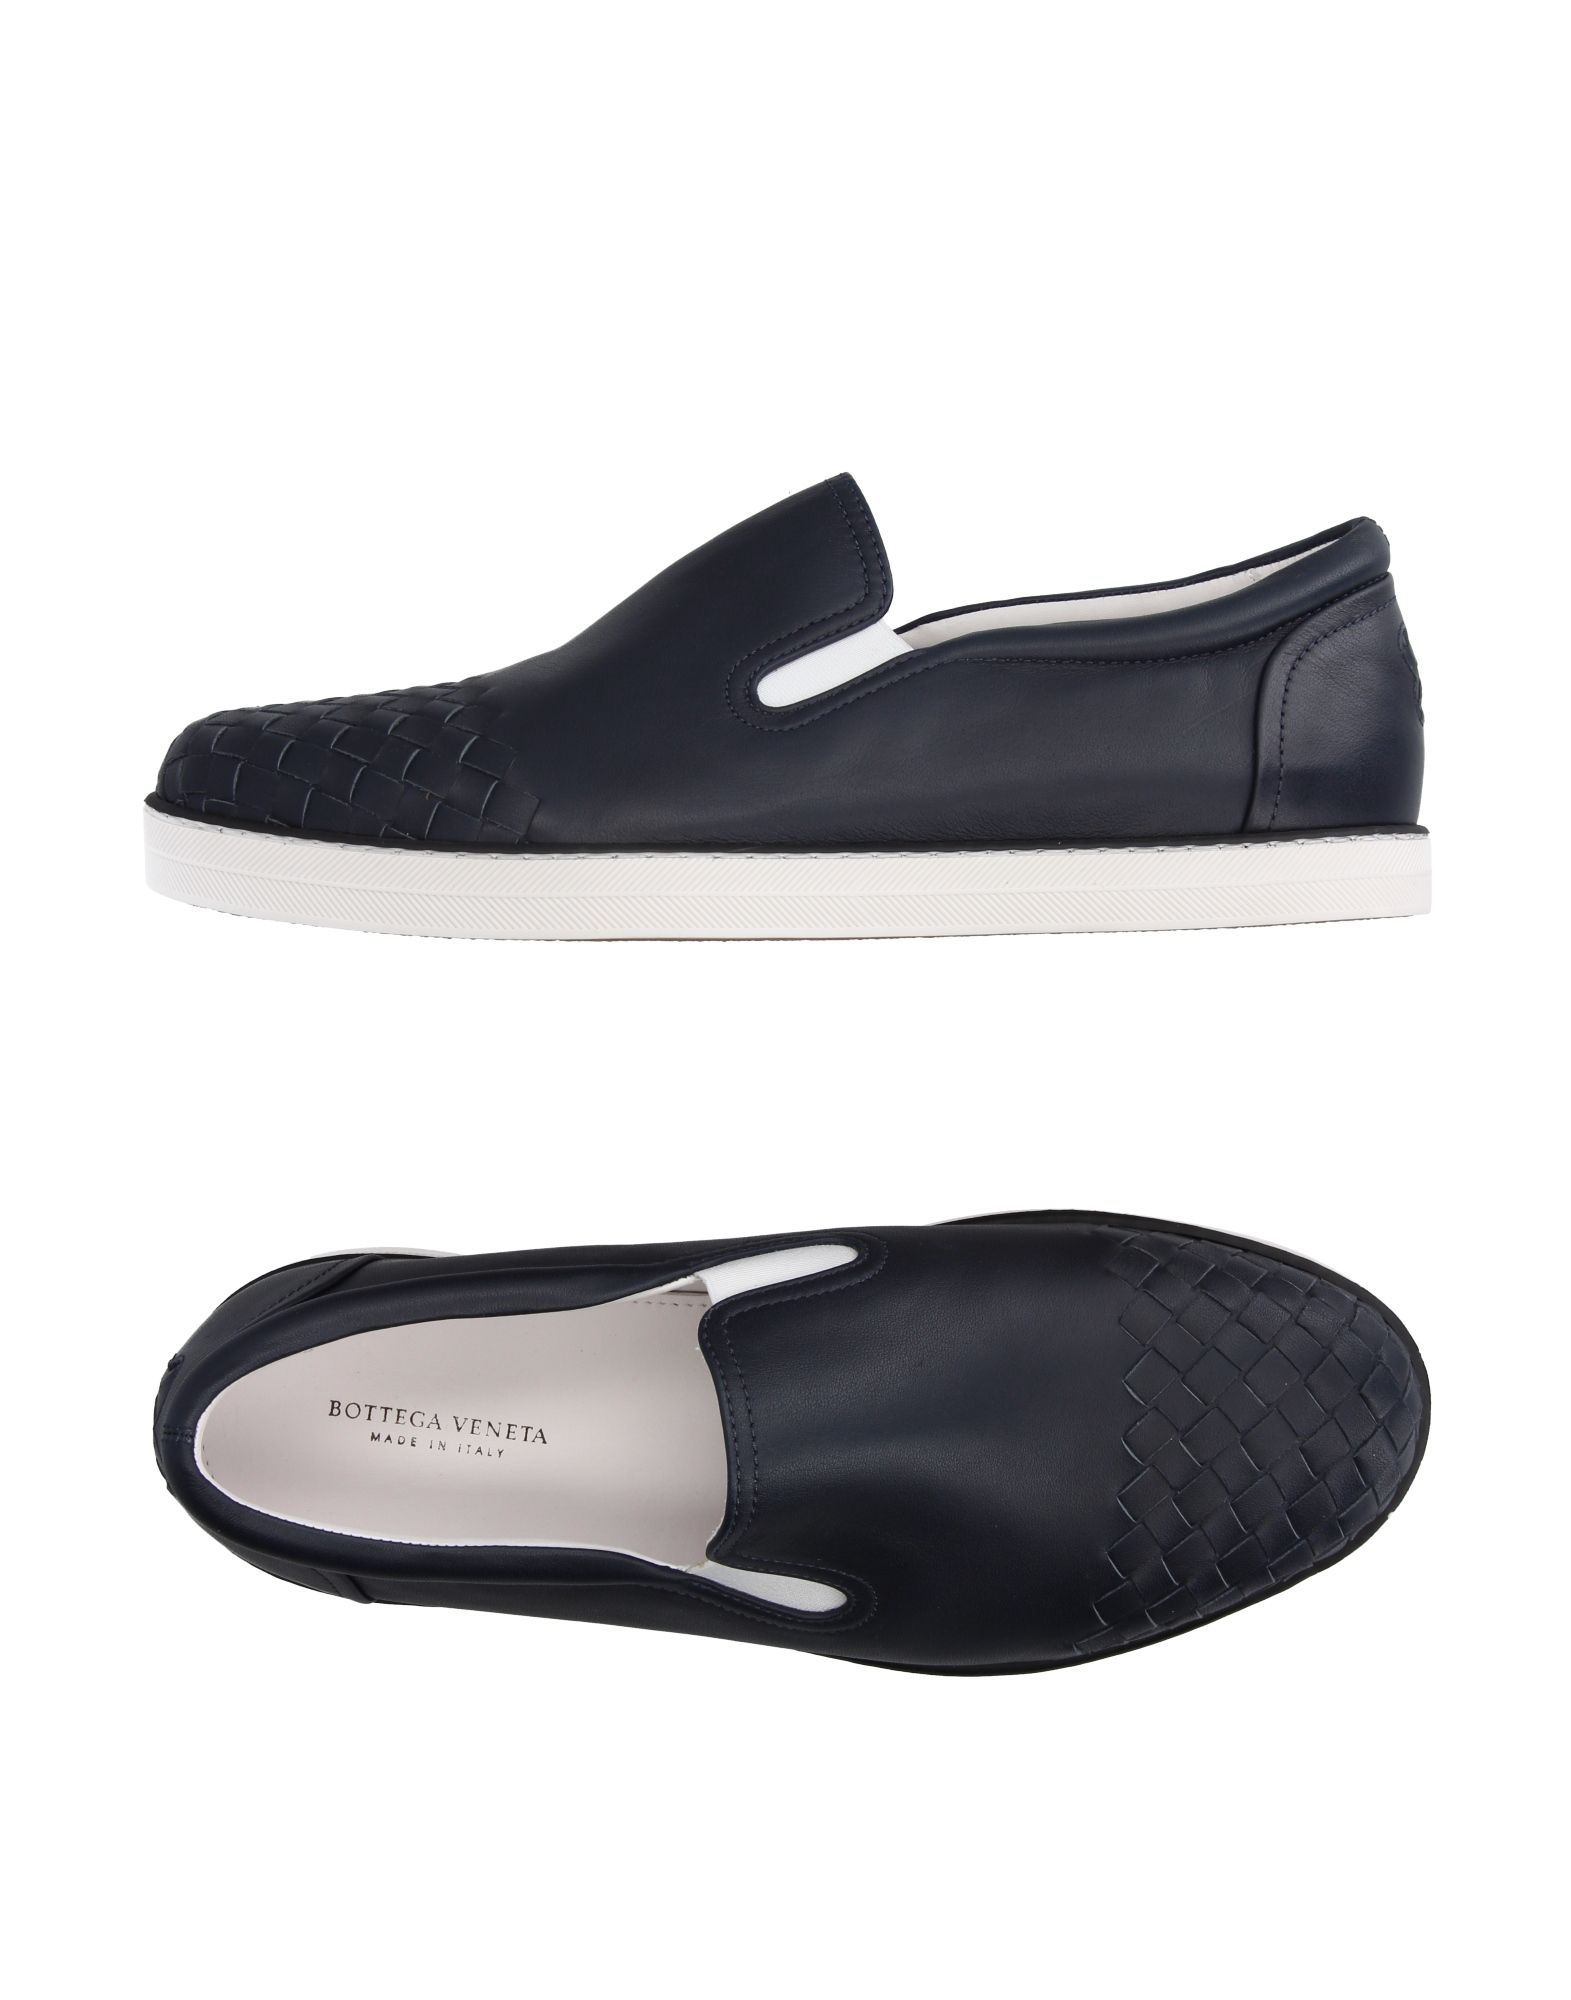 Bottega Veneta Sneakers Qualität Herren  11204748NI Gute Qualität Sneakers beliebte Schuhe 0d3c05